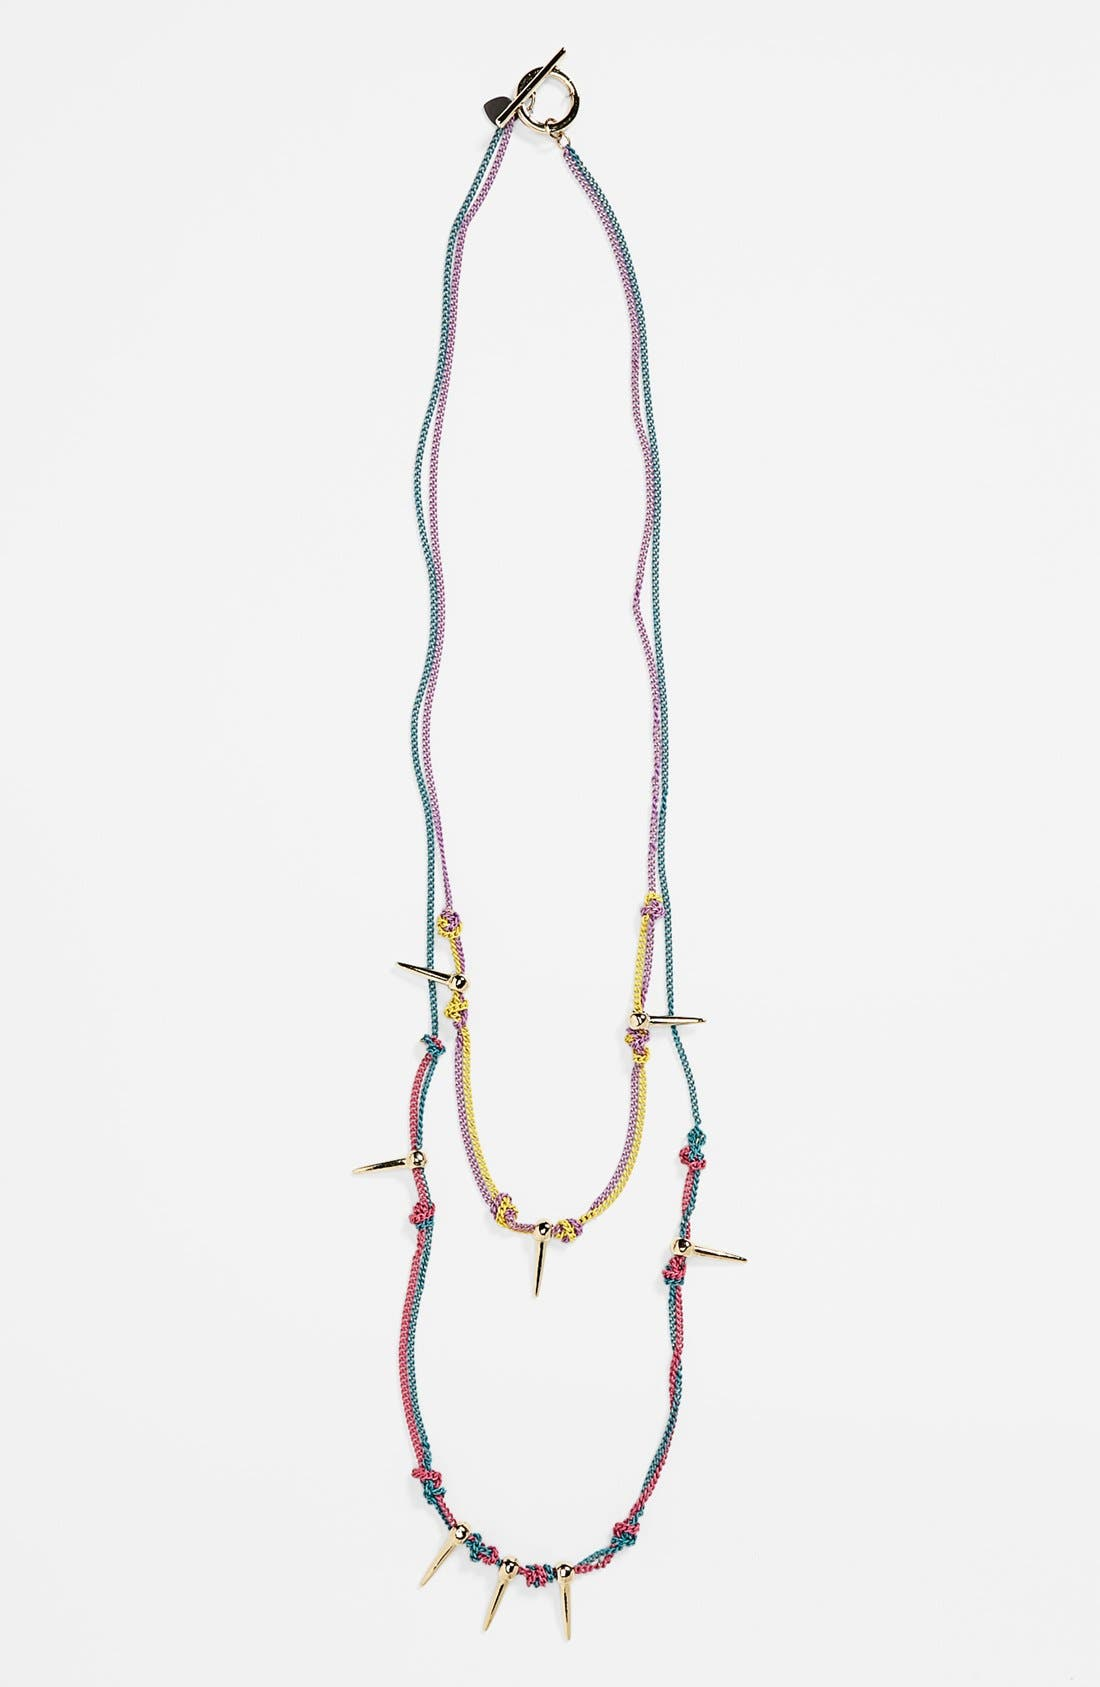 Main Image - Bonnie Jonas Spiked Multistrand Necklace